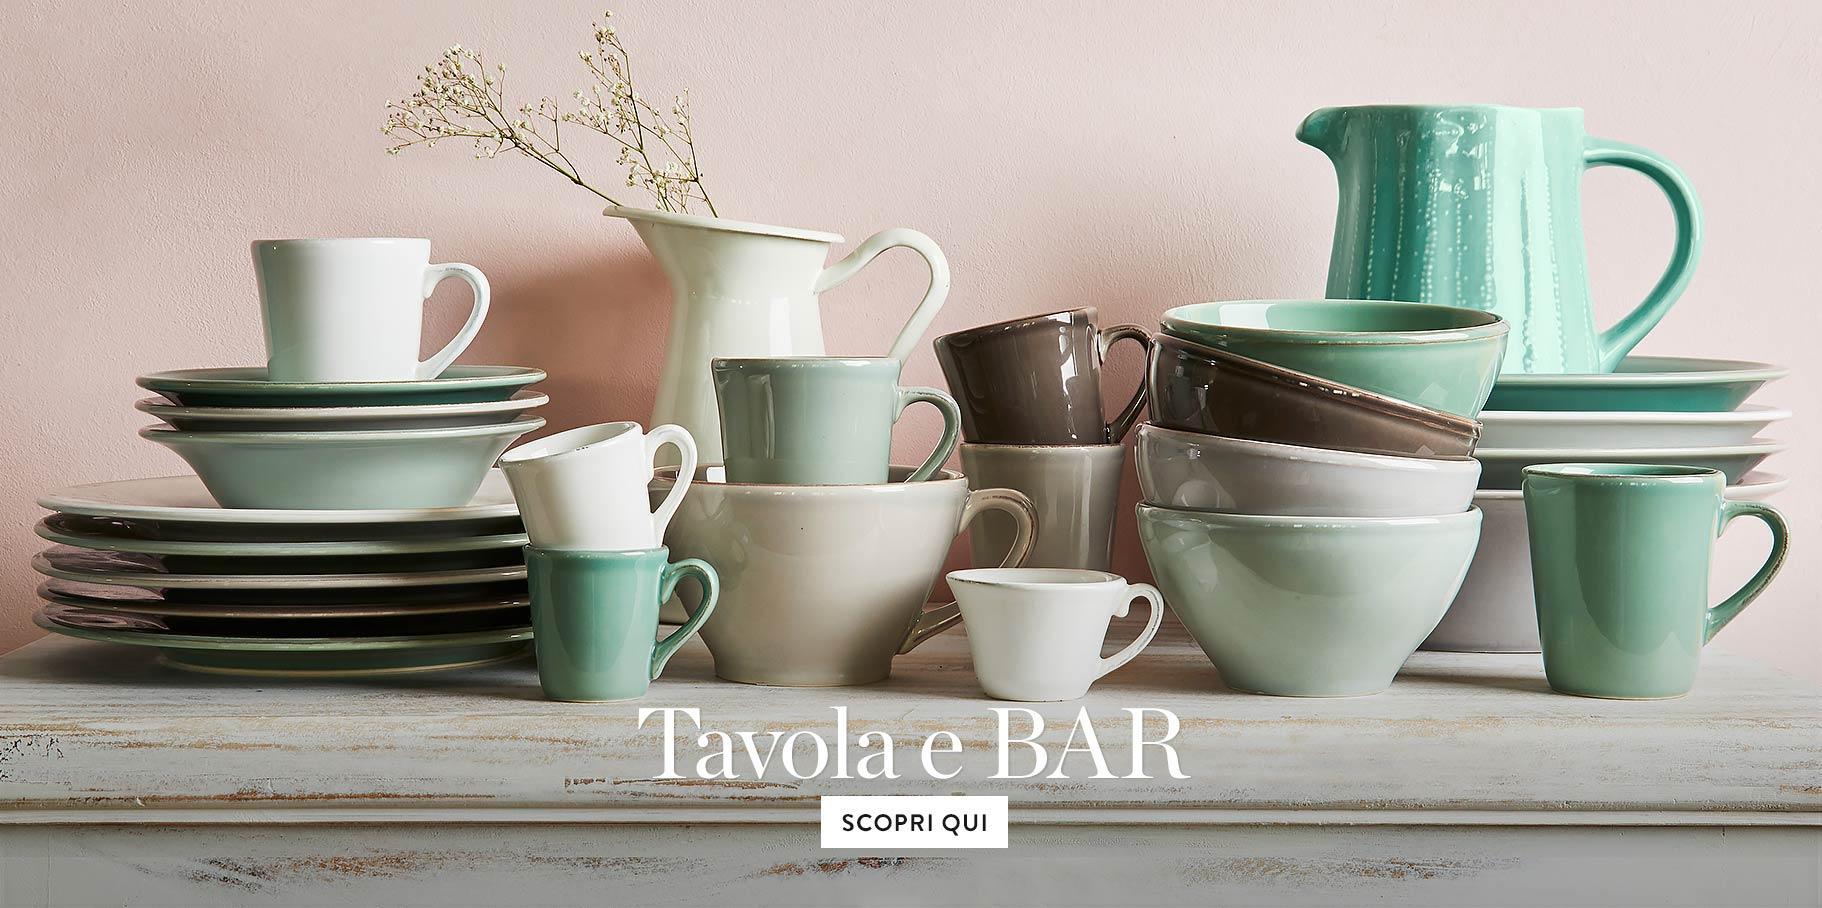 Home_-_Tavola_e_bar